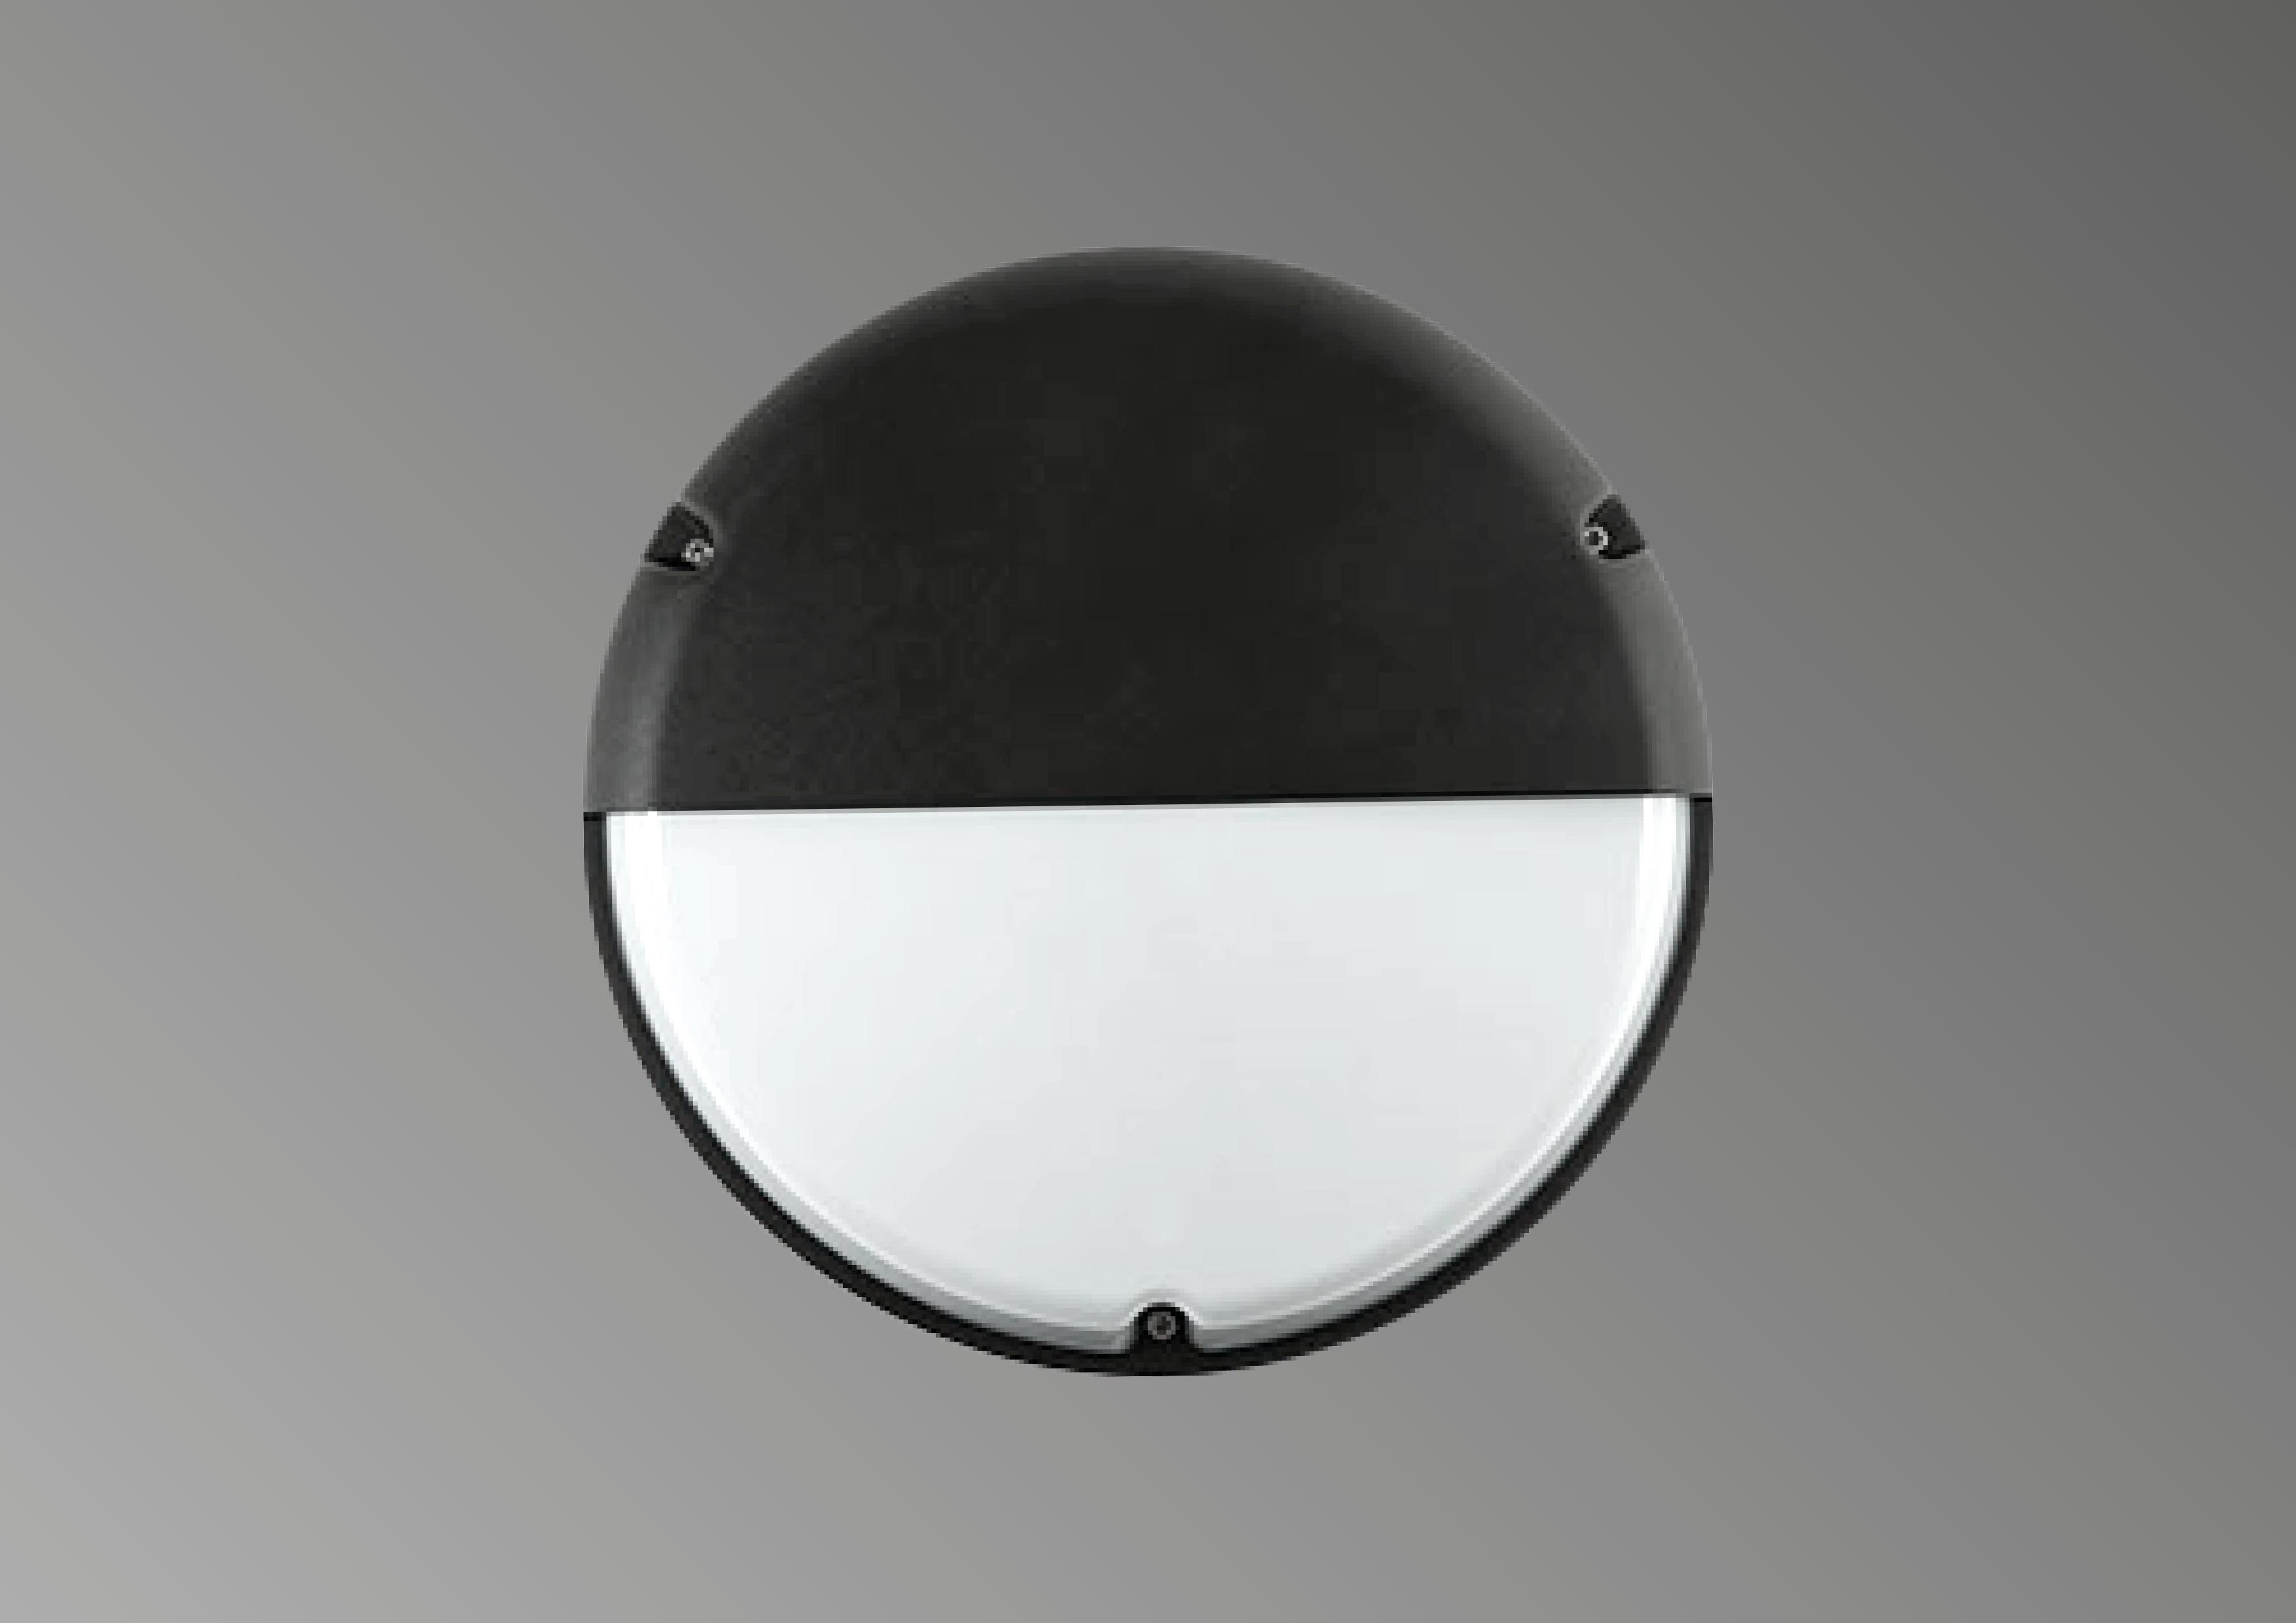 https://contrac-lighting.co.uk/wp-content/uploads/2018/01/LEO-HALFHOOD-BULKHEAD-2.jpg